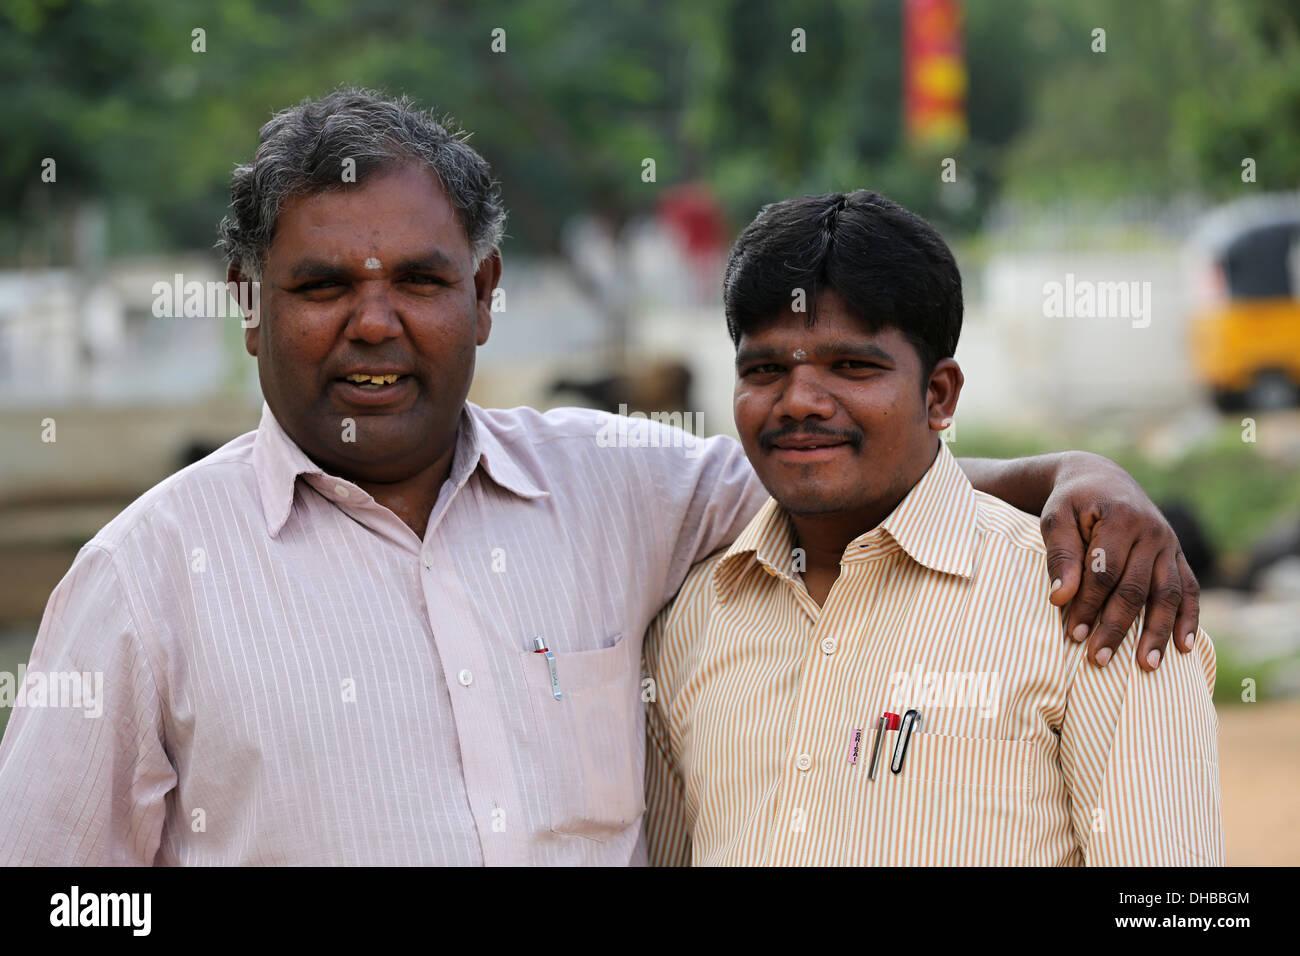 Indische Lehrer Andhra Pradesh in Indien Stockbild